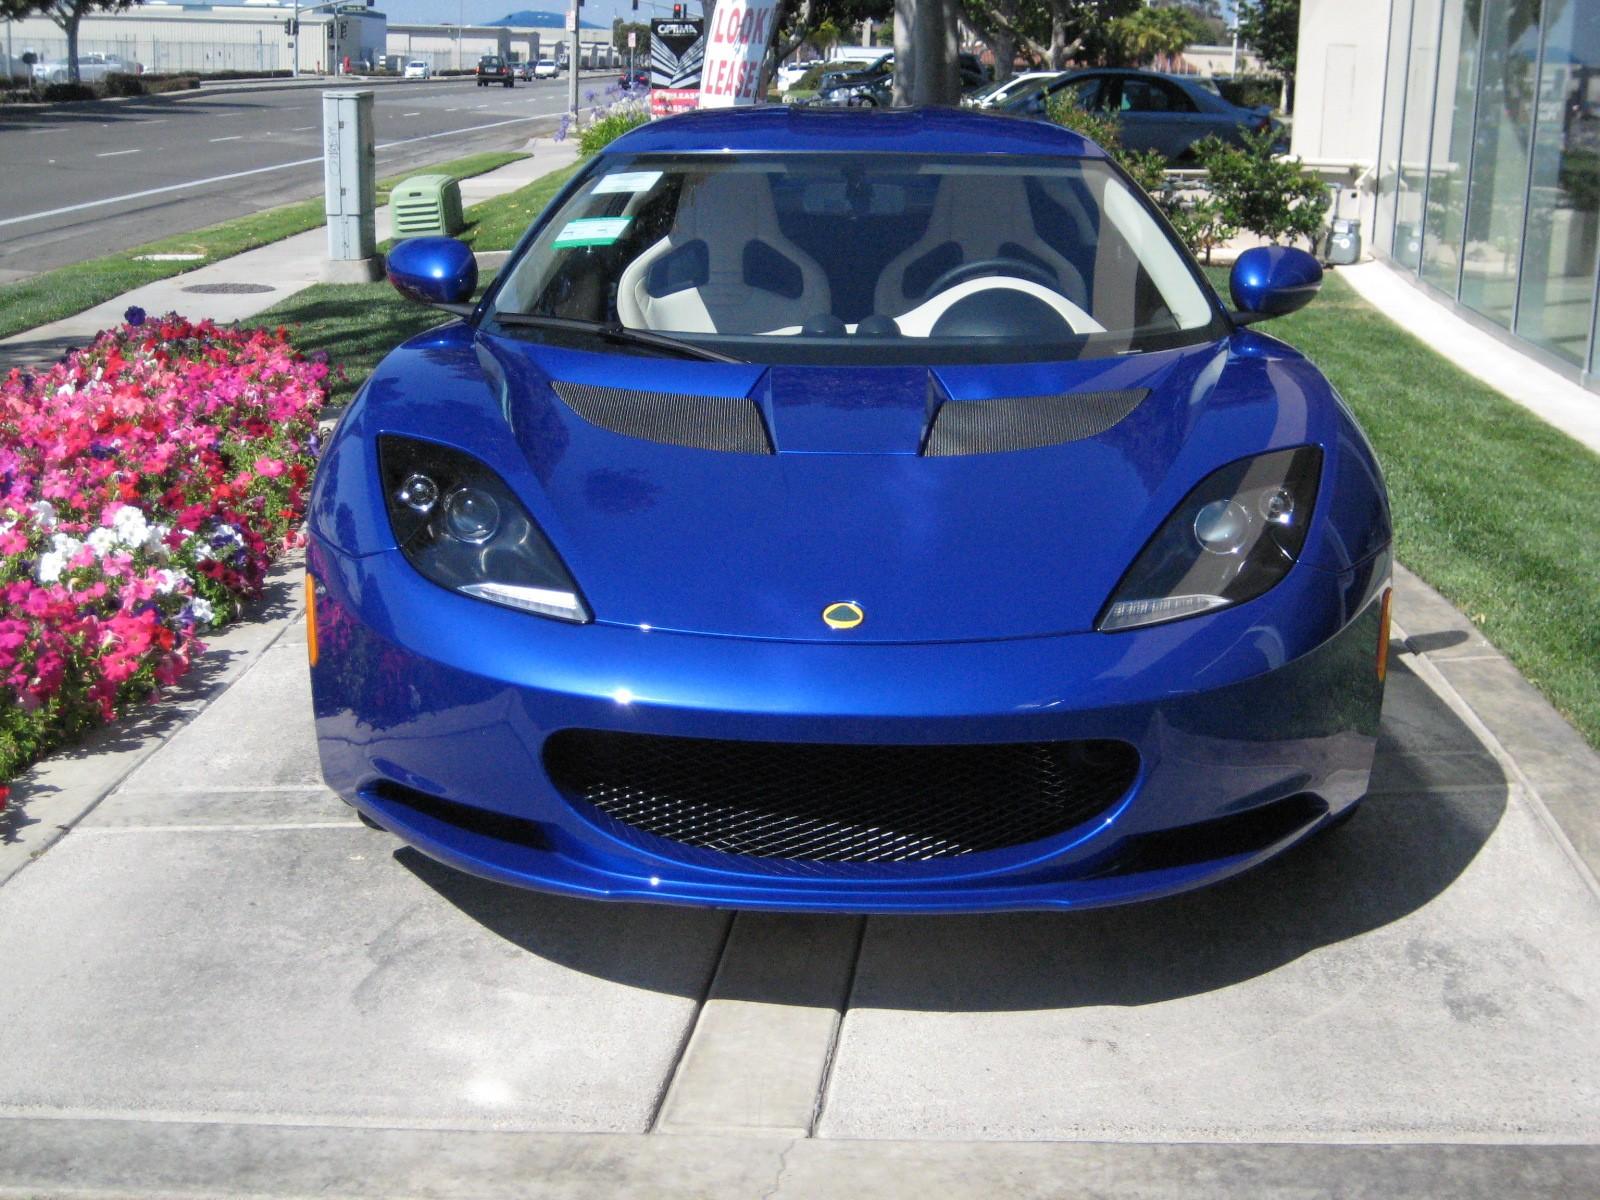 post best color combos so far - lotustalk - the lotus cars community